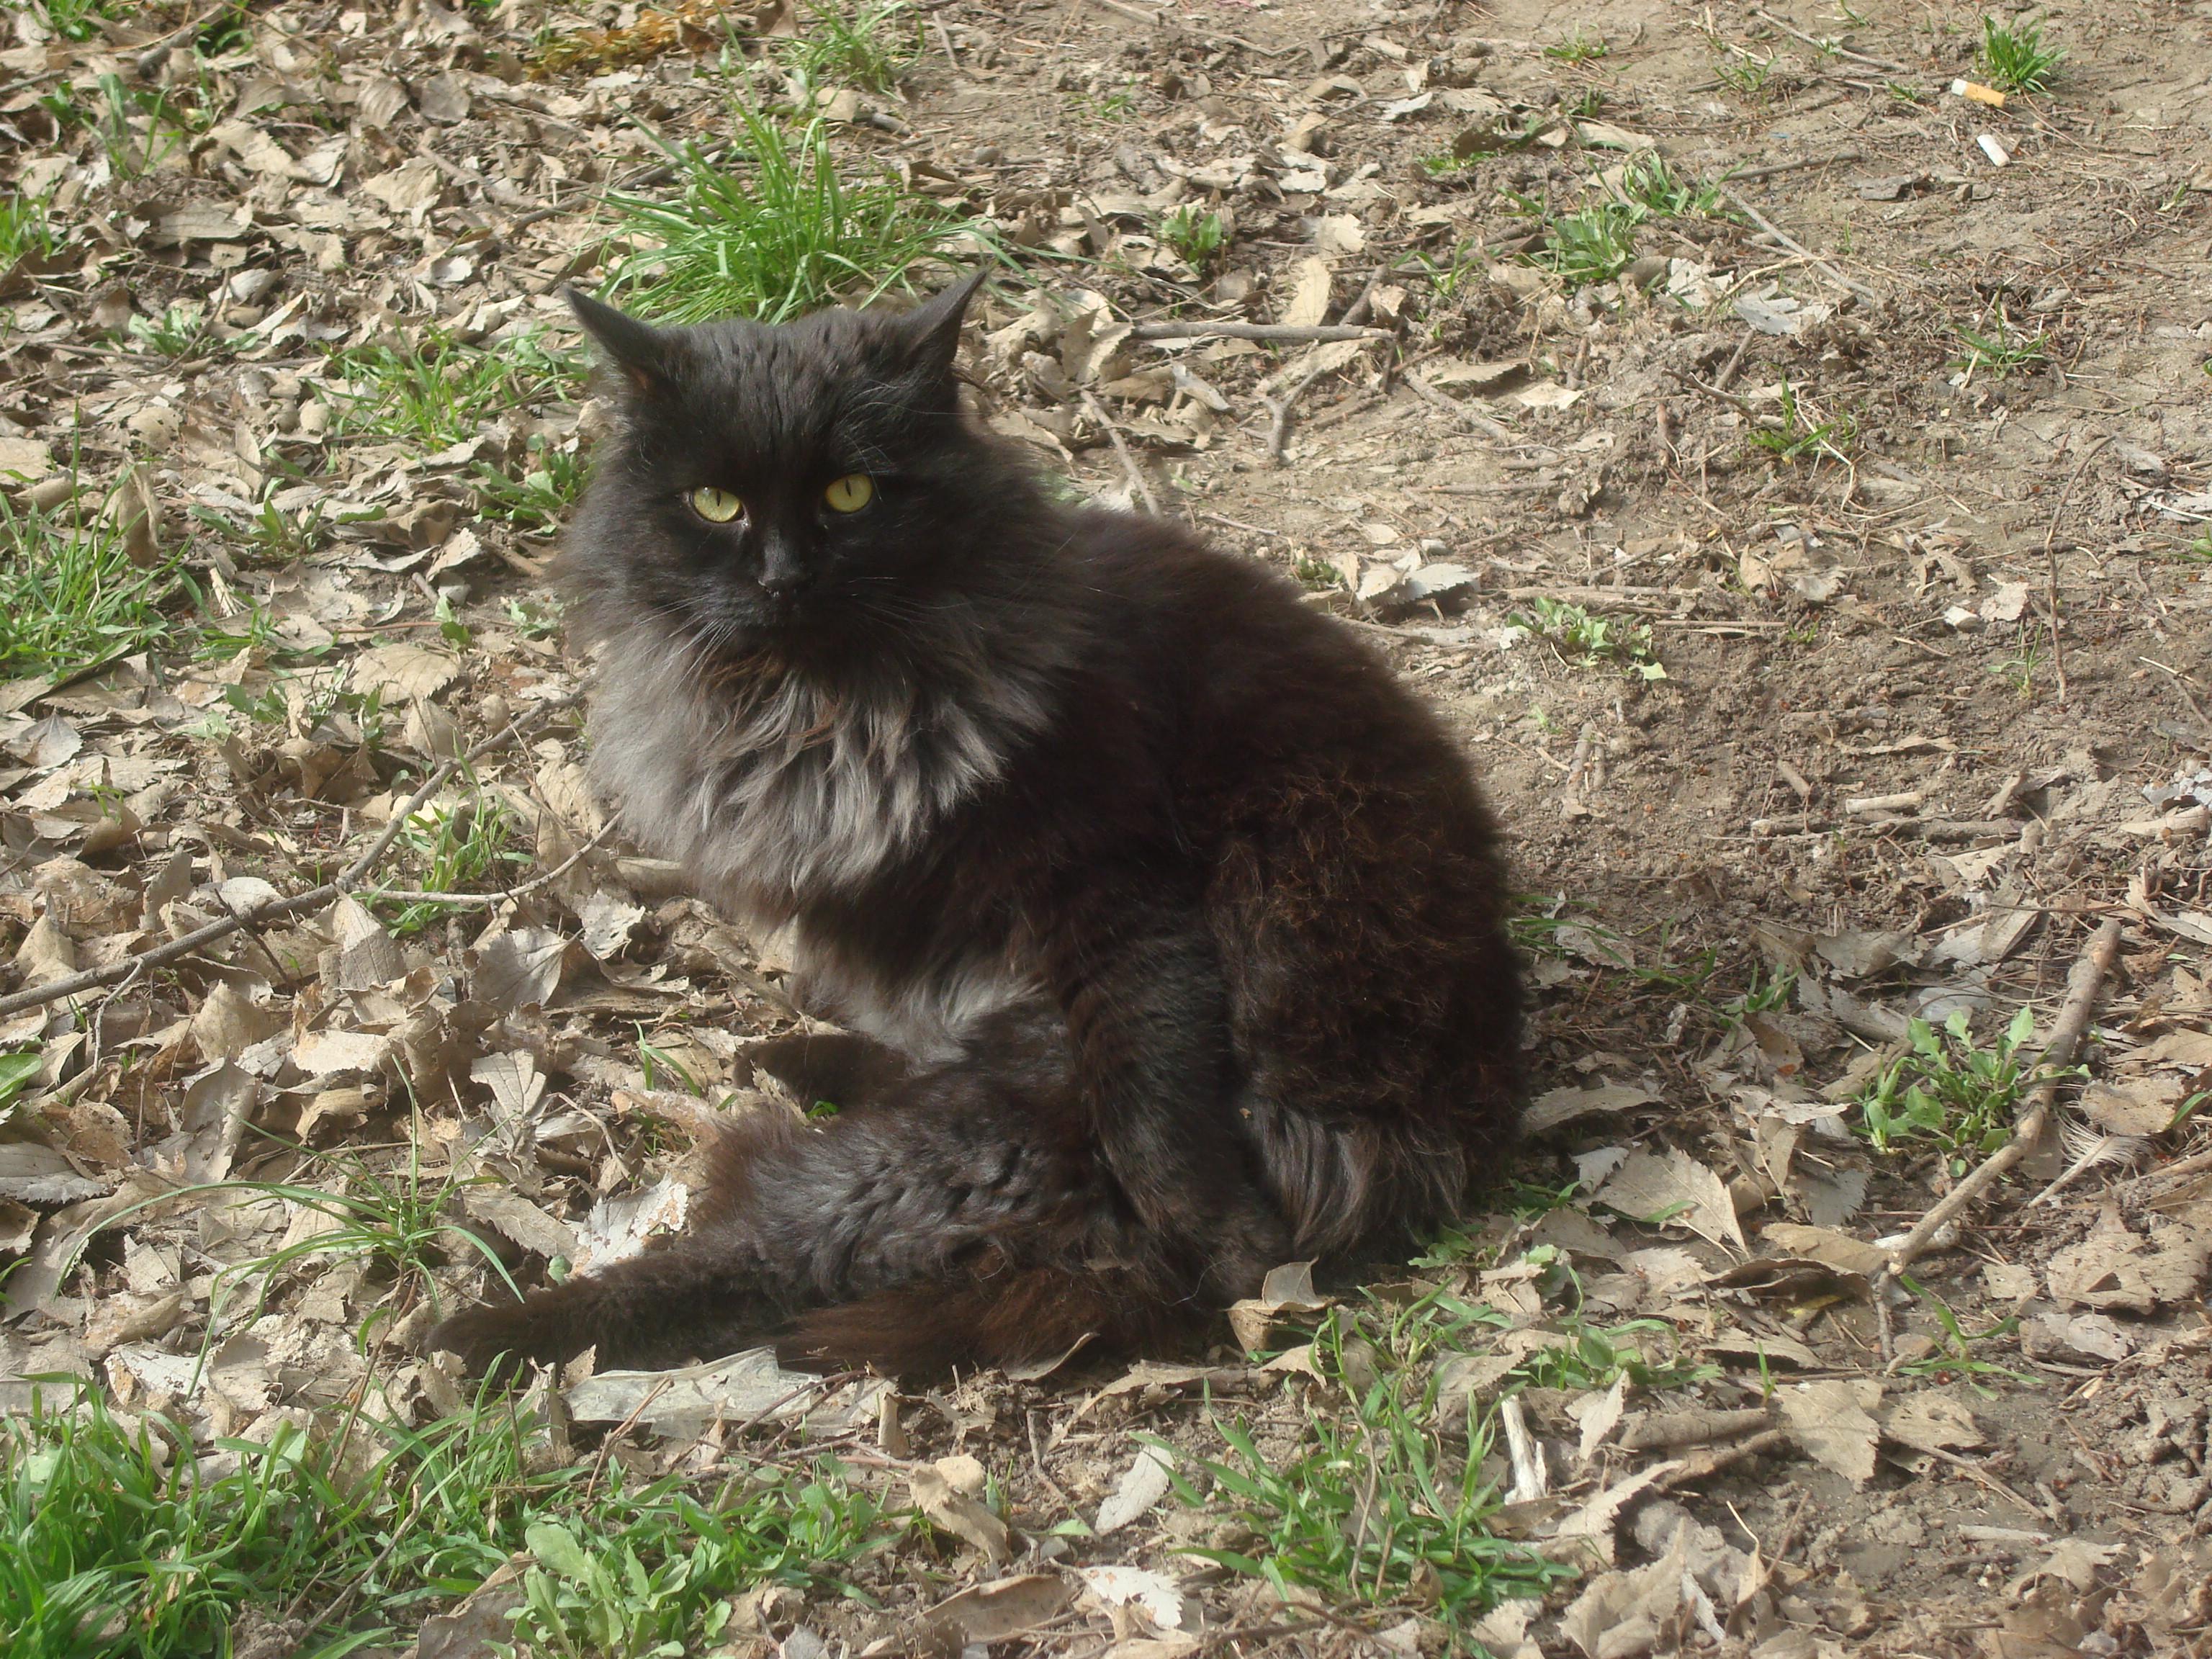 Black street cat, Animal, Nature, Wild, Urban, HQ Photo